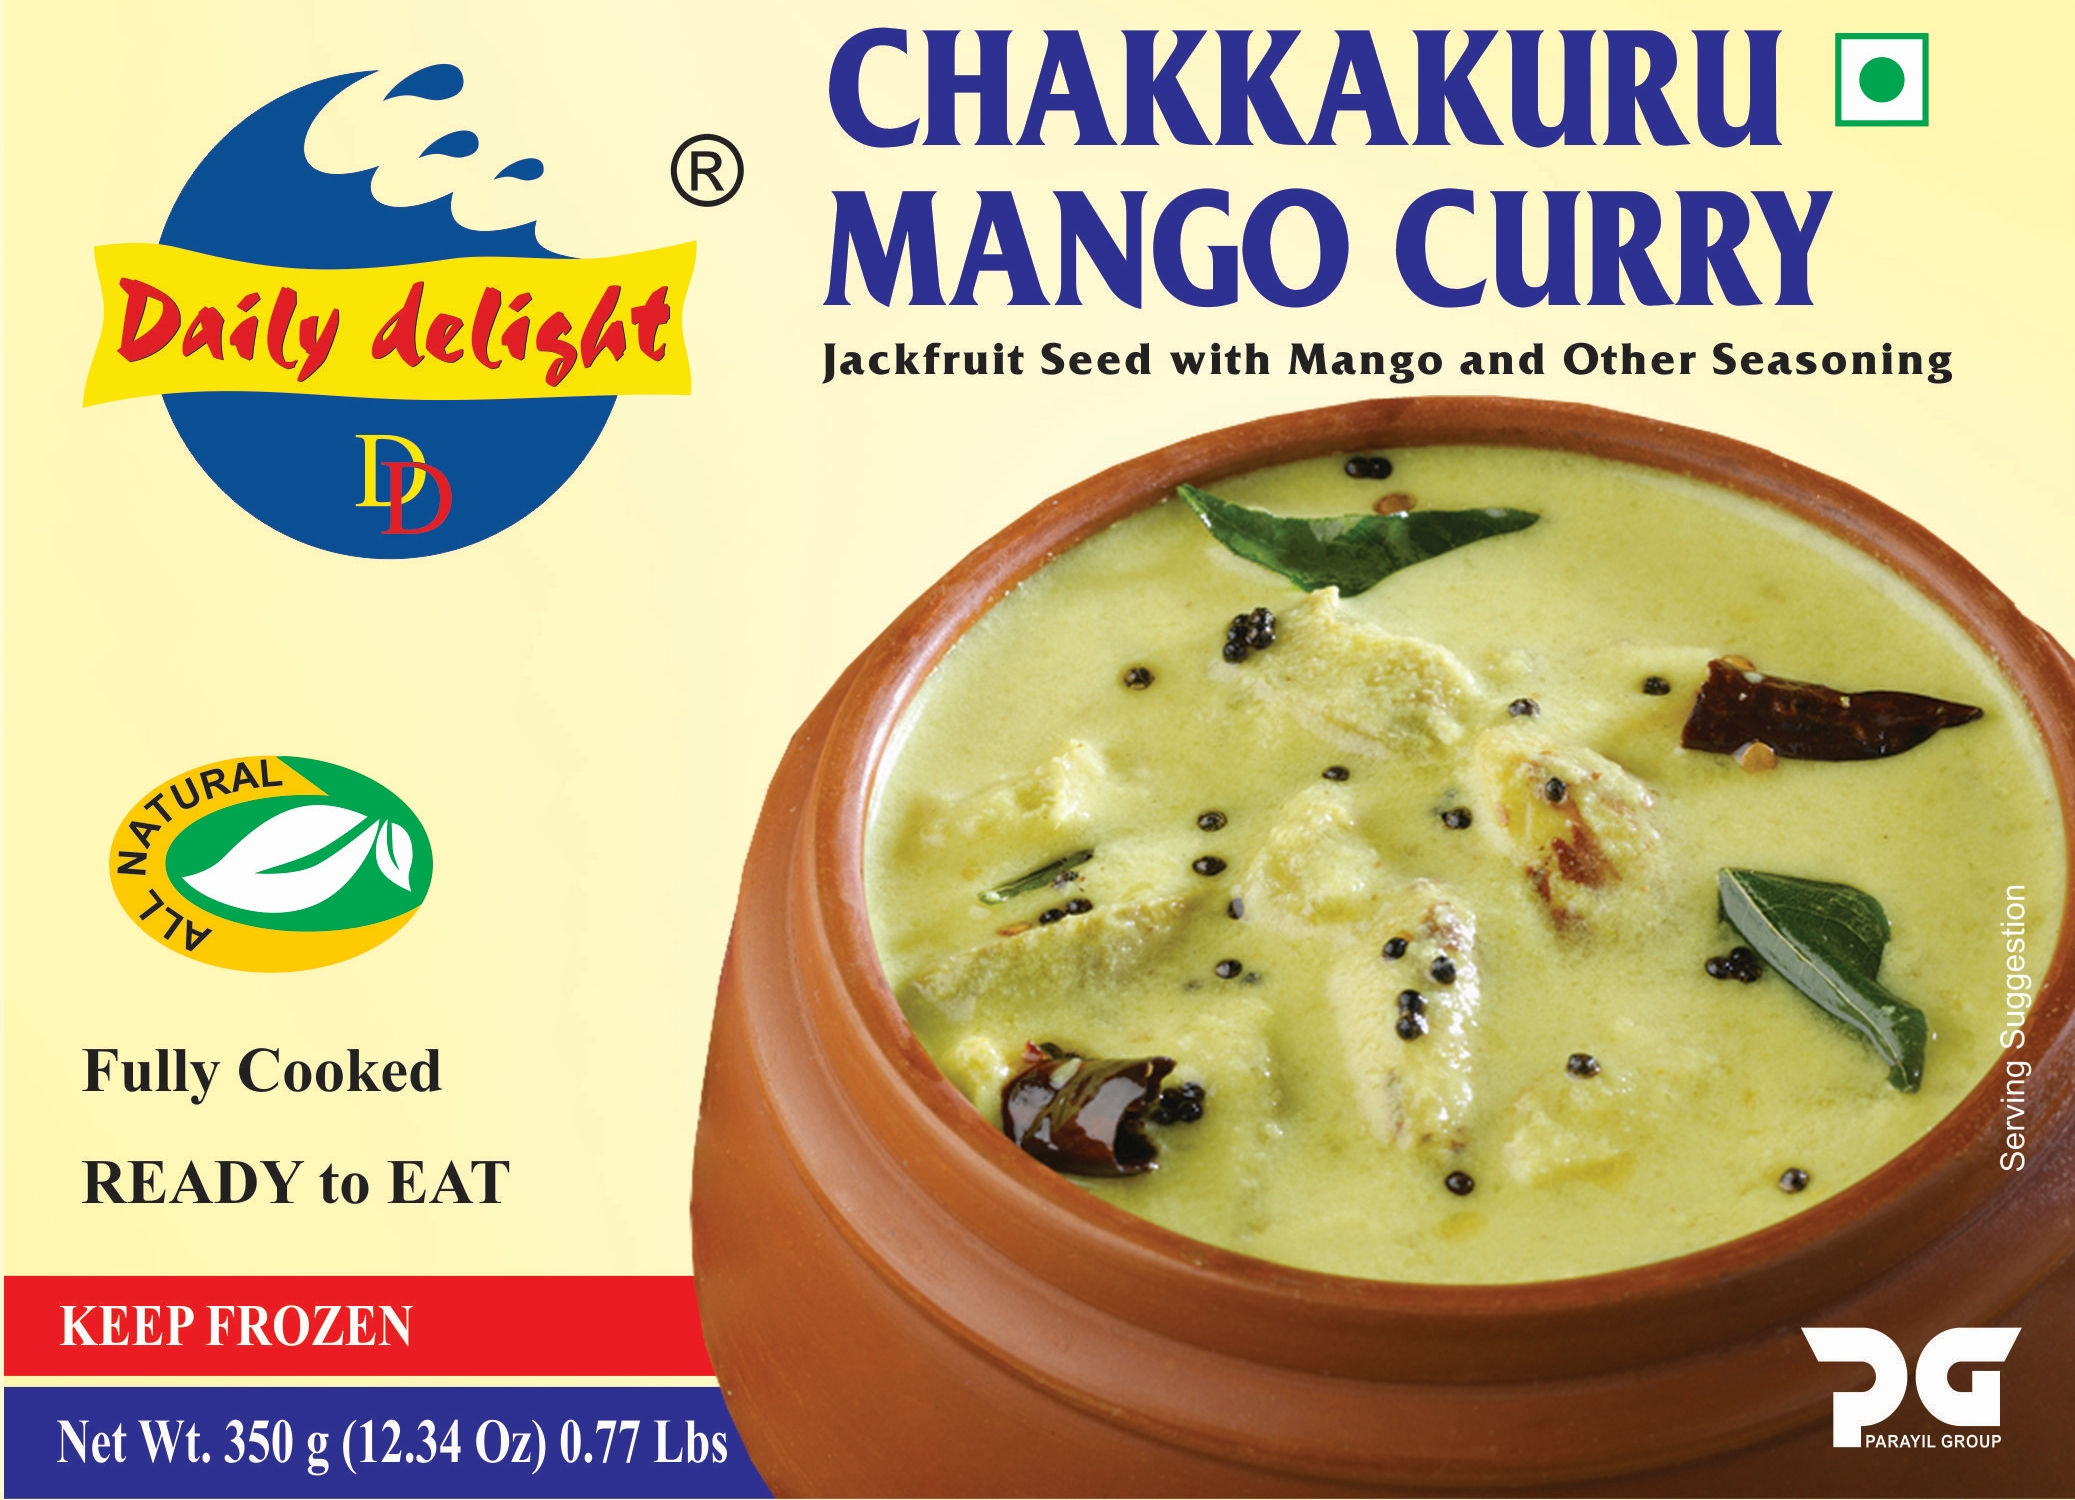 Daily Delight Chakkakuru Mango Curry